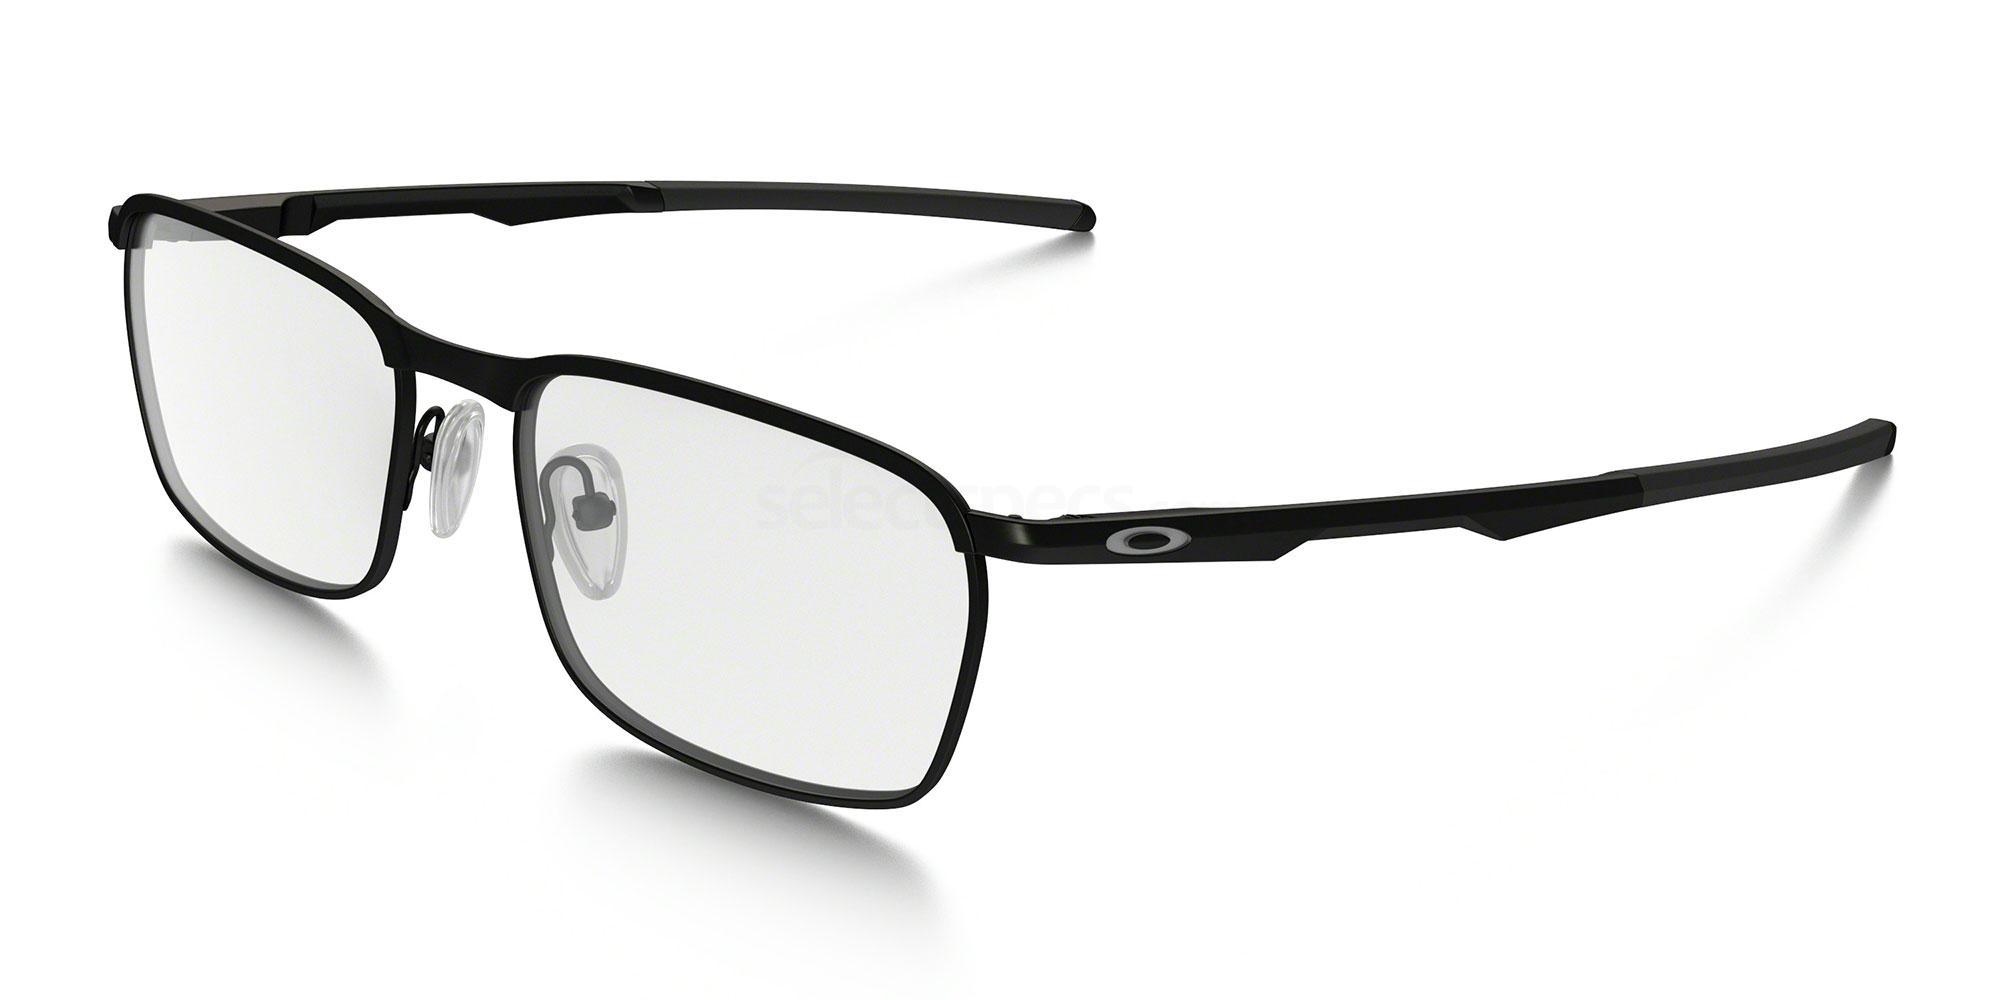 318601 OX3186 CONDUCTOR Glasses, Oakley